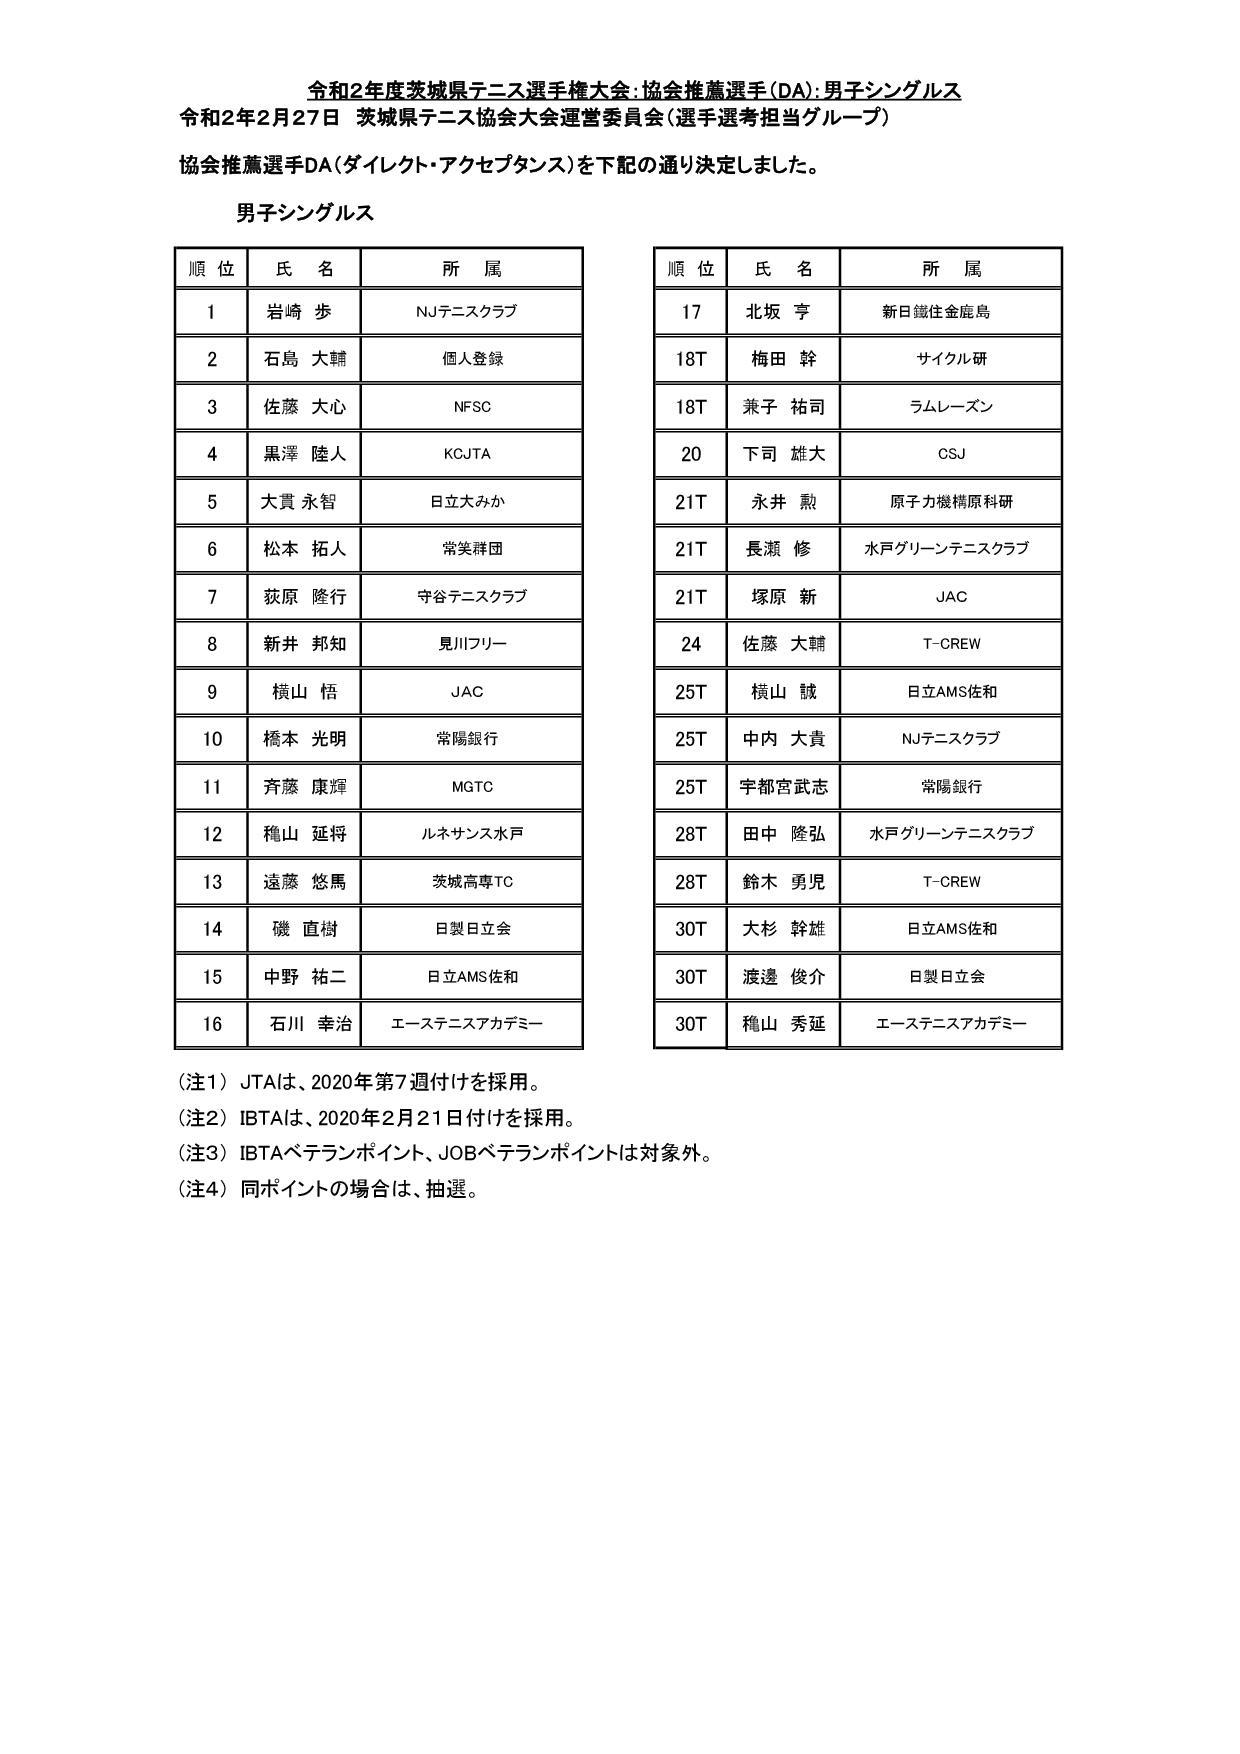 2018_KenSensyuken_Suisen_List_rev1